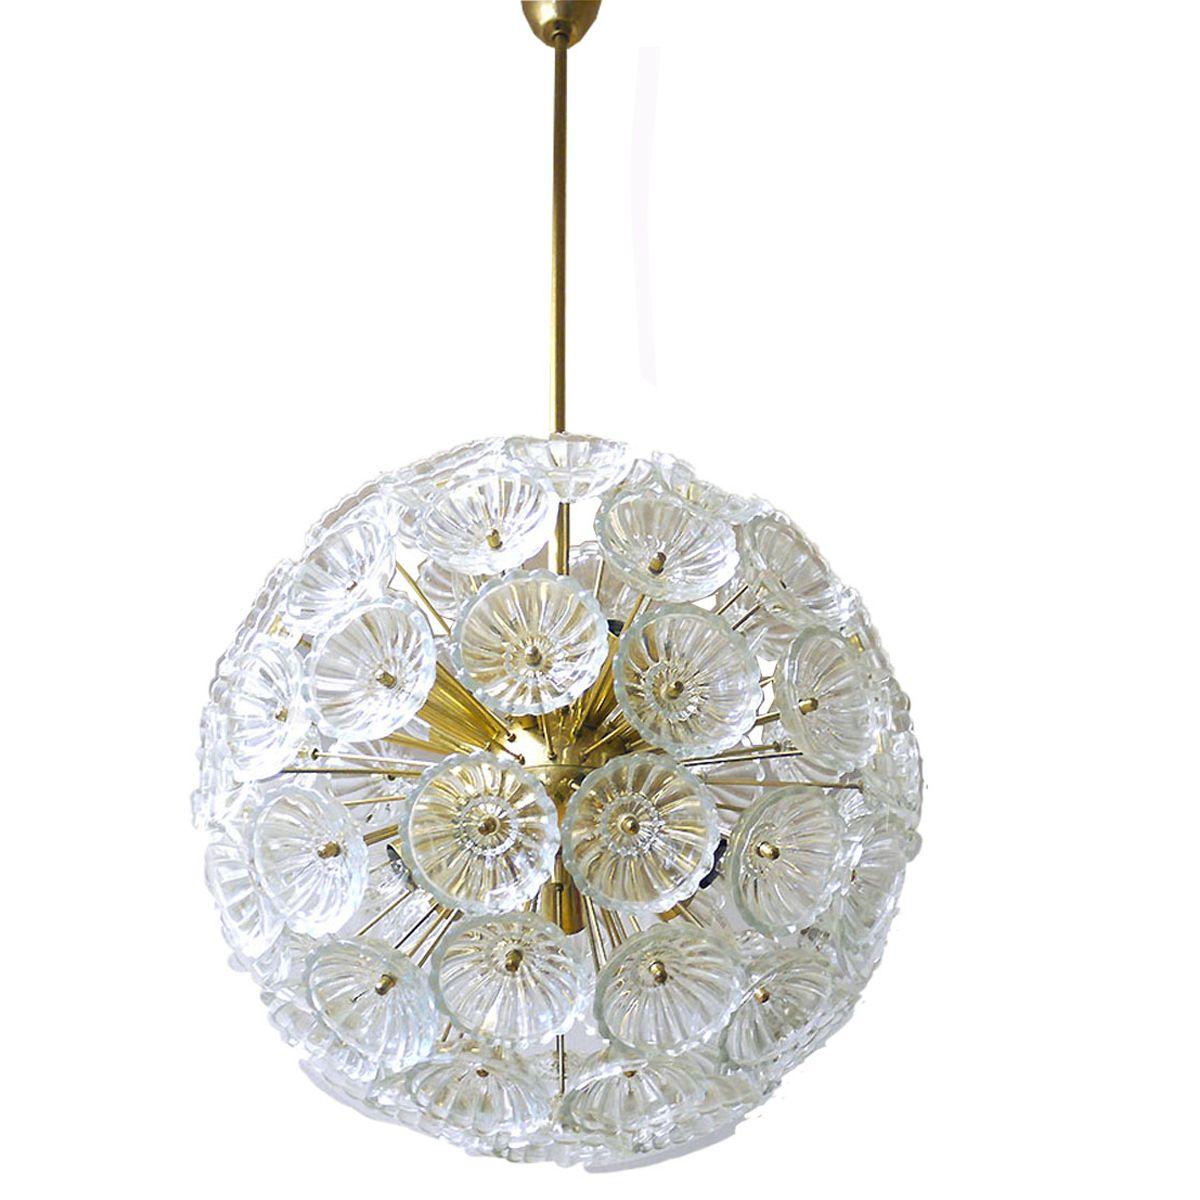 Sputnik christmas ornaments - Mid Century German Starburst Sputnik Chandelier With 79 Glass Flowers 1965